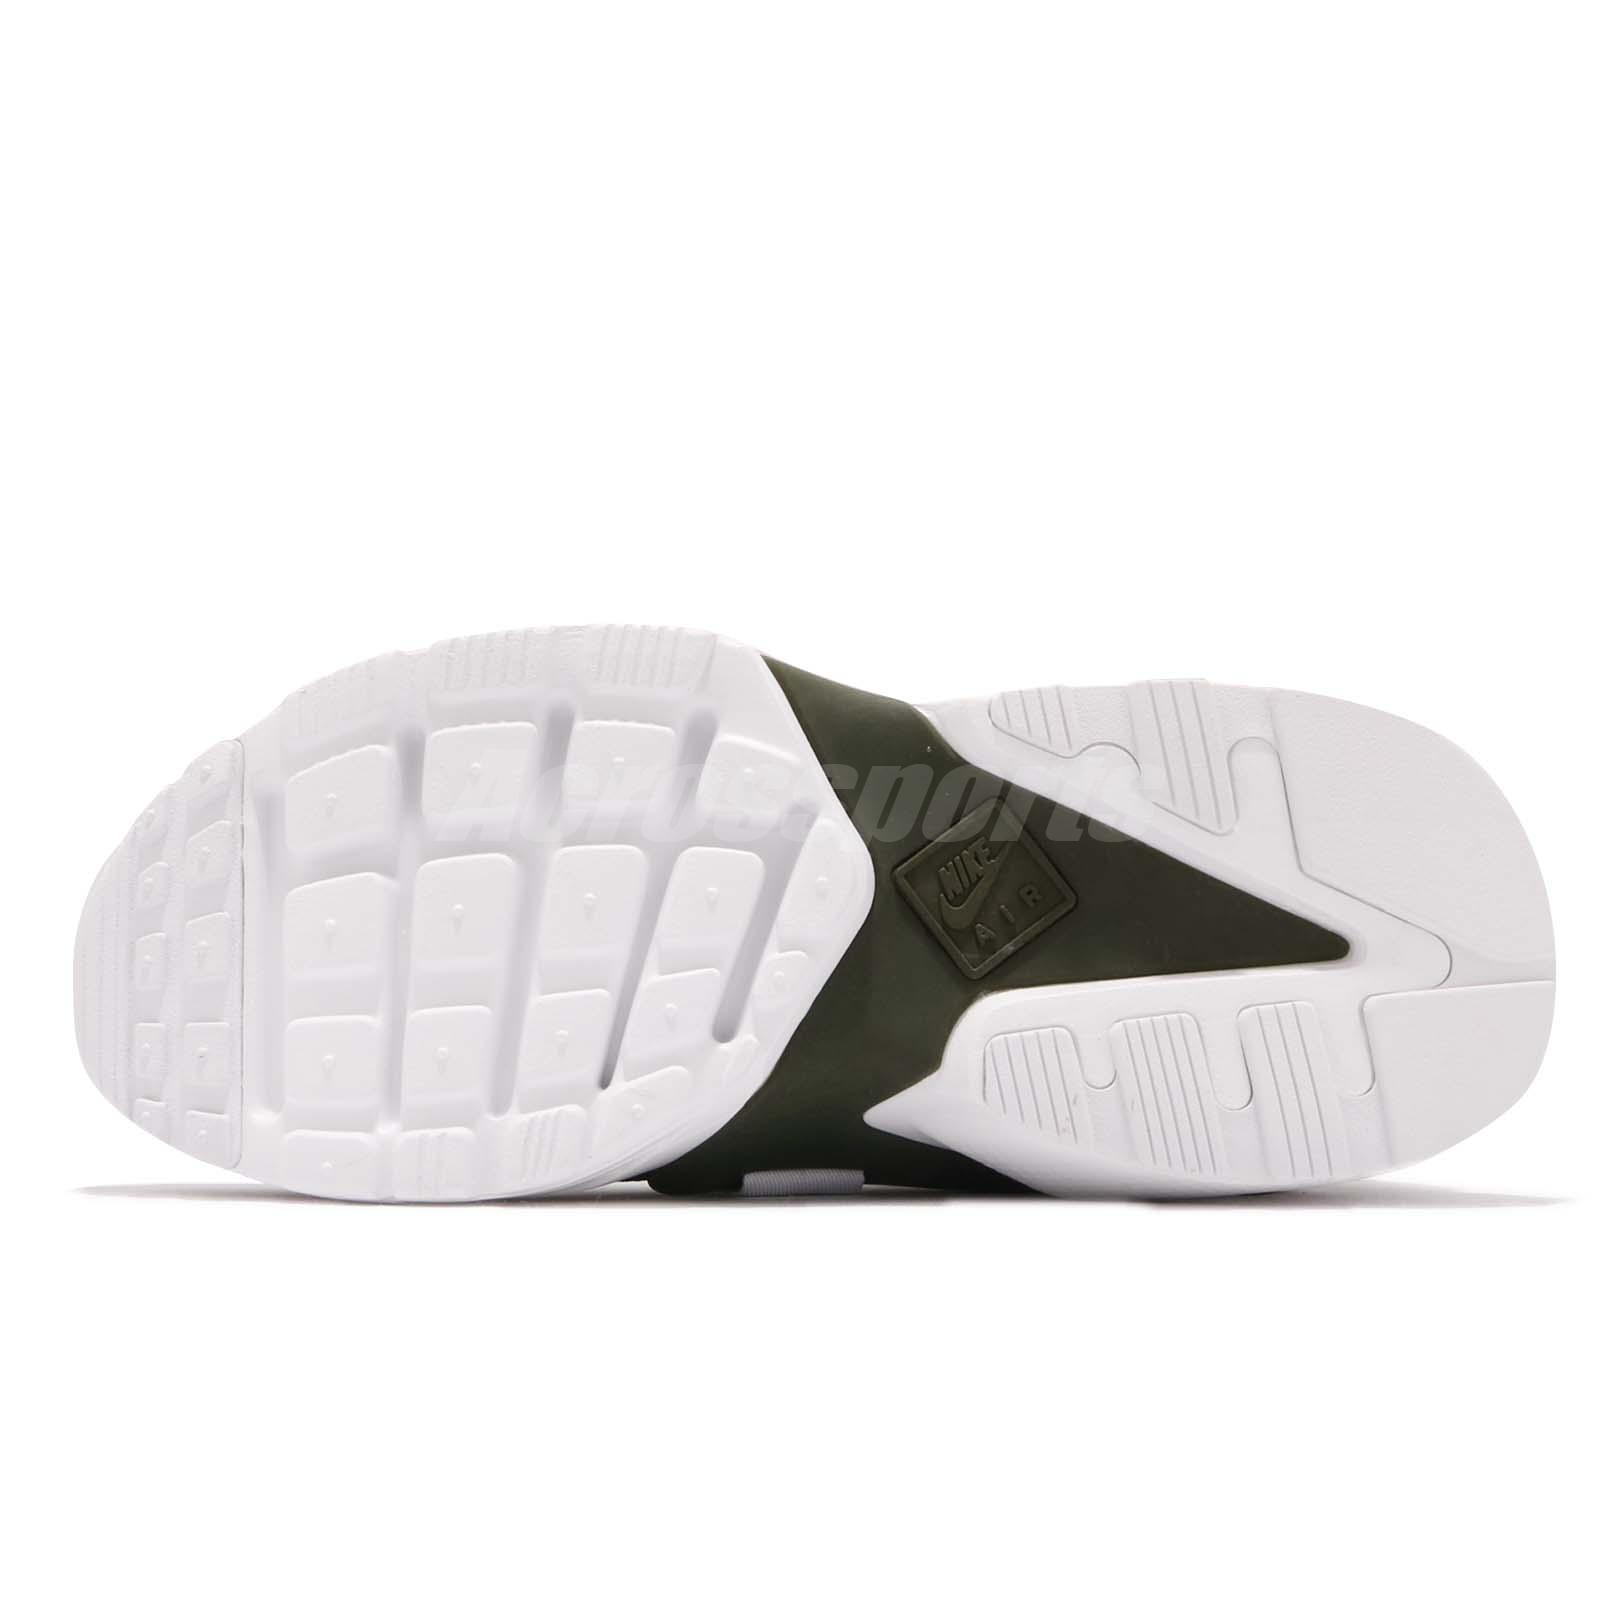 01ca7b7f7c7ff Nike W Air Huarache City Low Cargo Khaki Green White Women Shoes ...